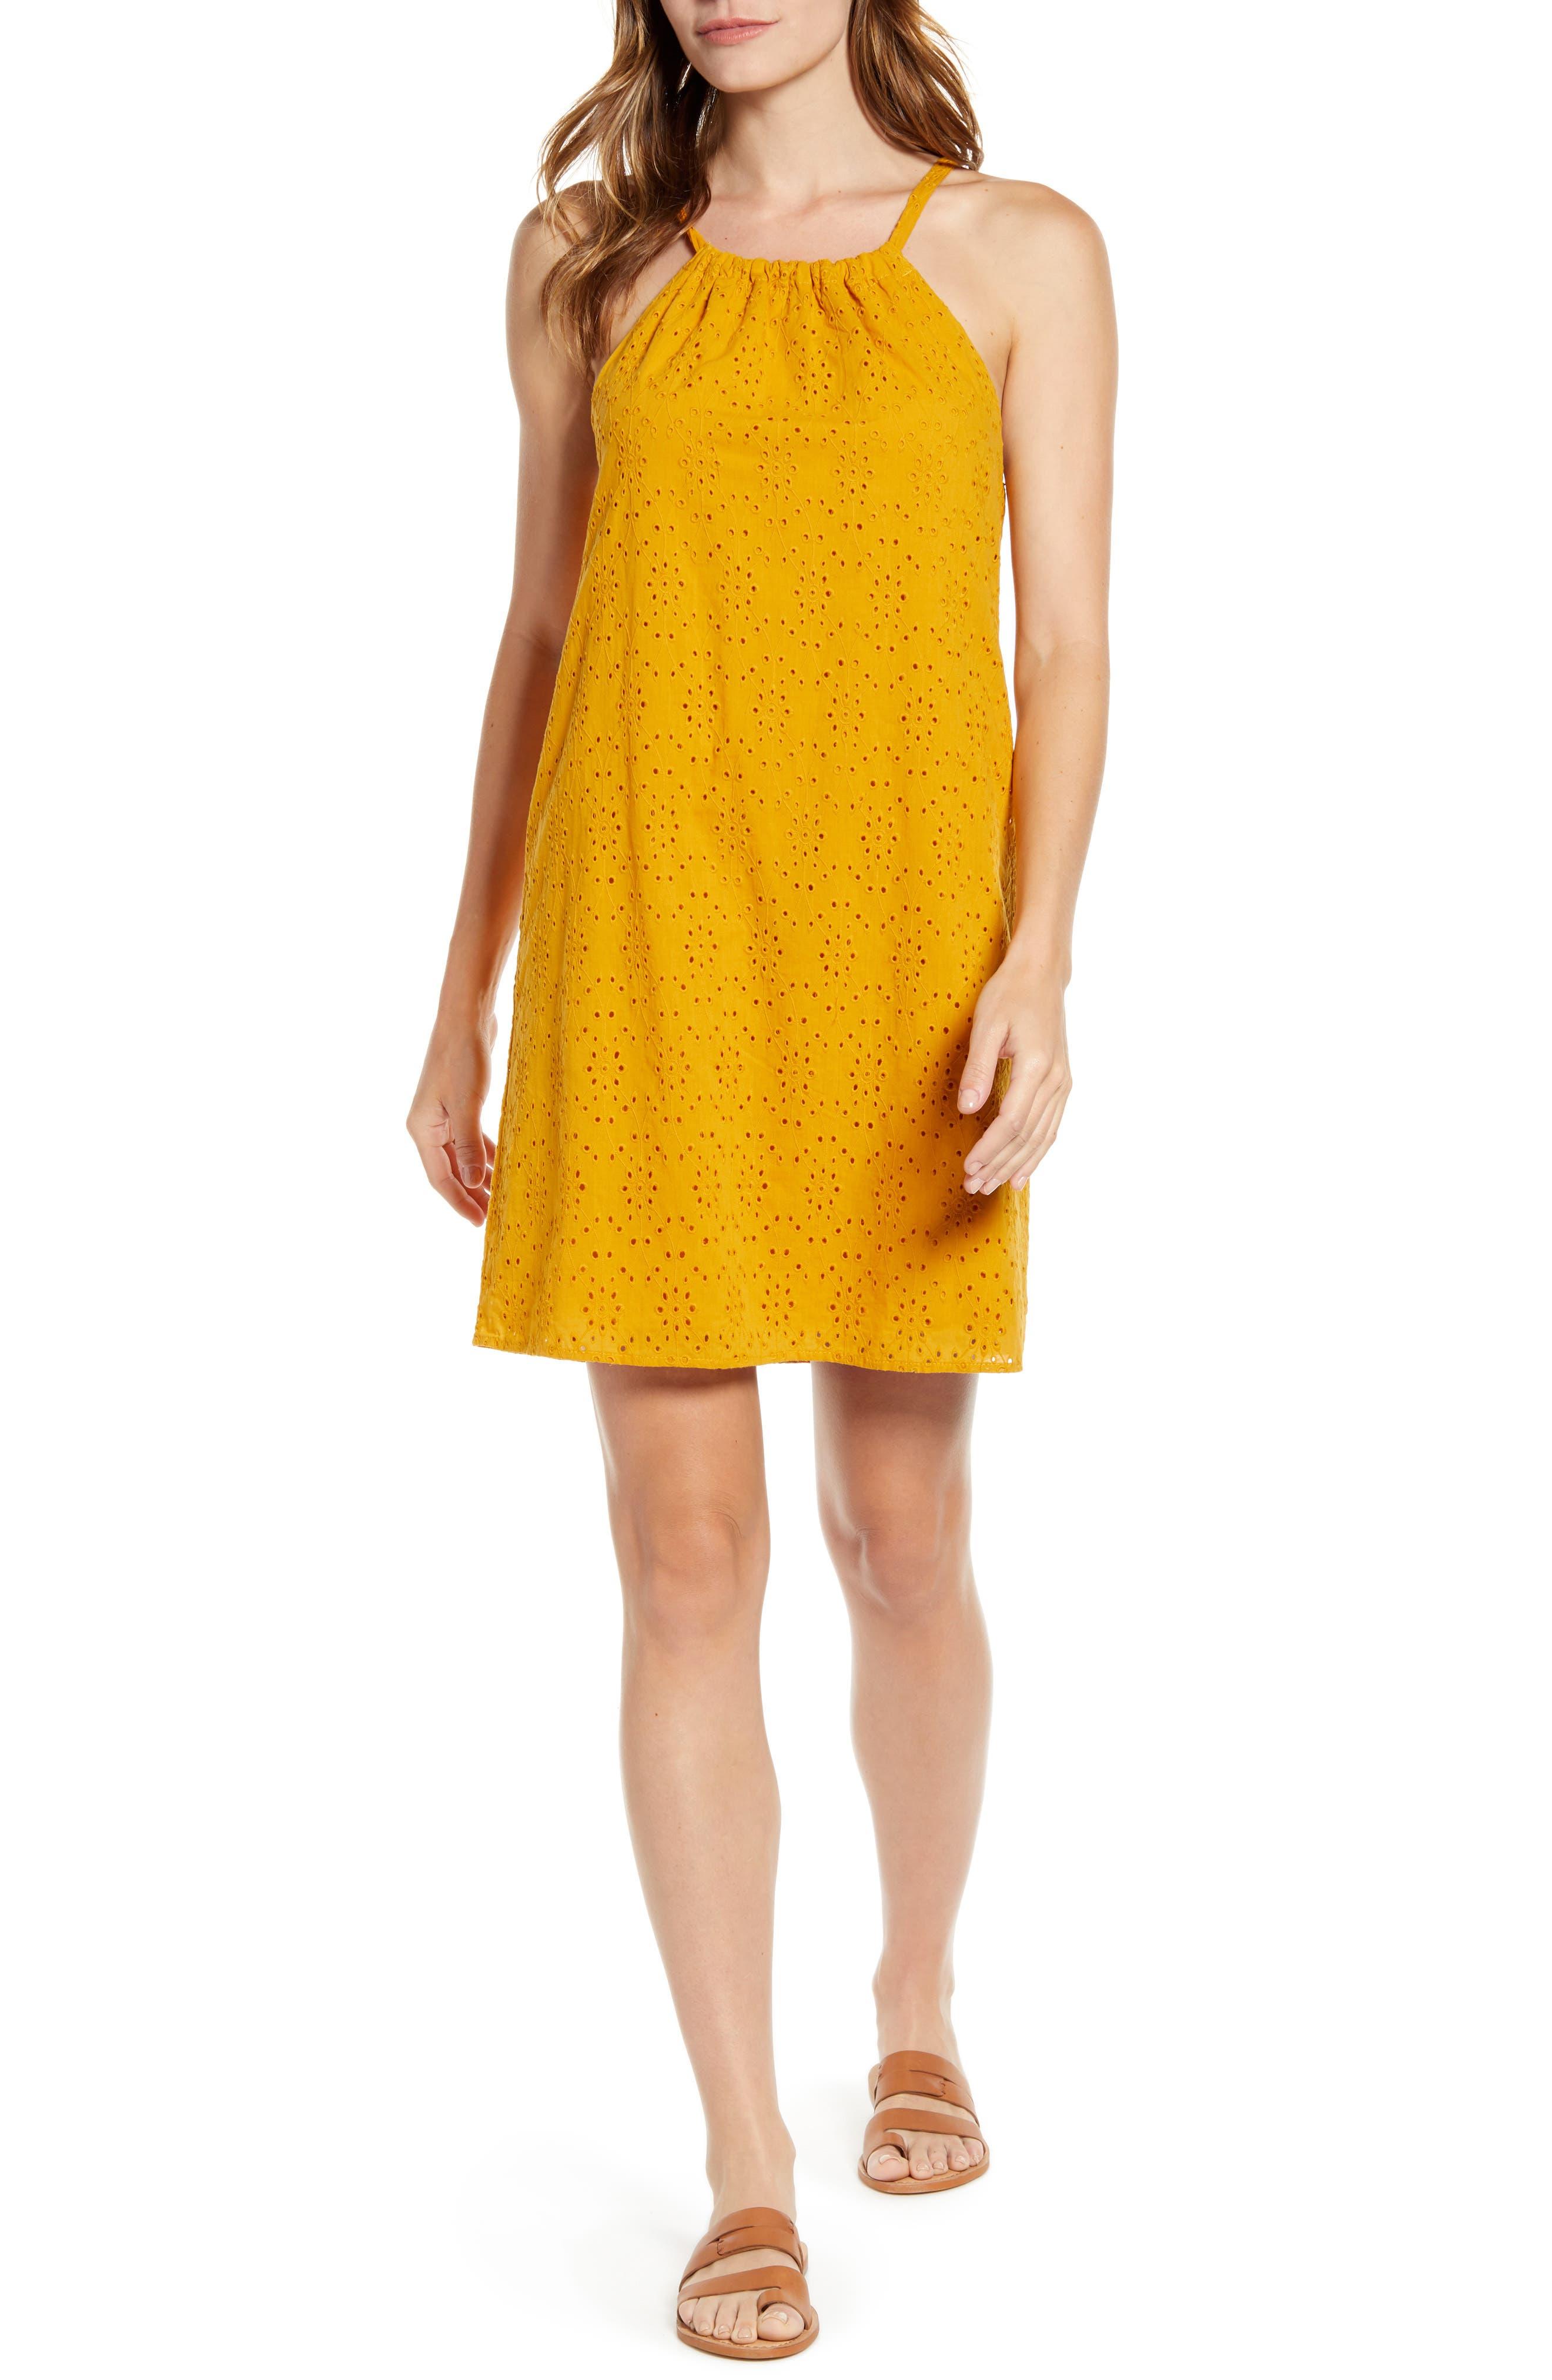 Petite Gibson X Hot Summer Nights Two Peas Eyelet Halter Summer Dress, Yellow (Regular & Petite) (Nordstrom Exclusive)